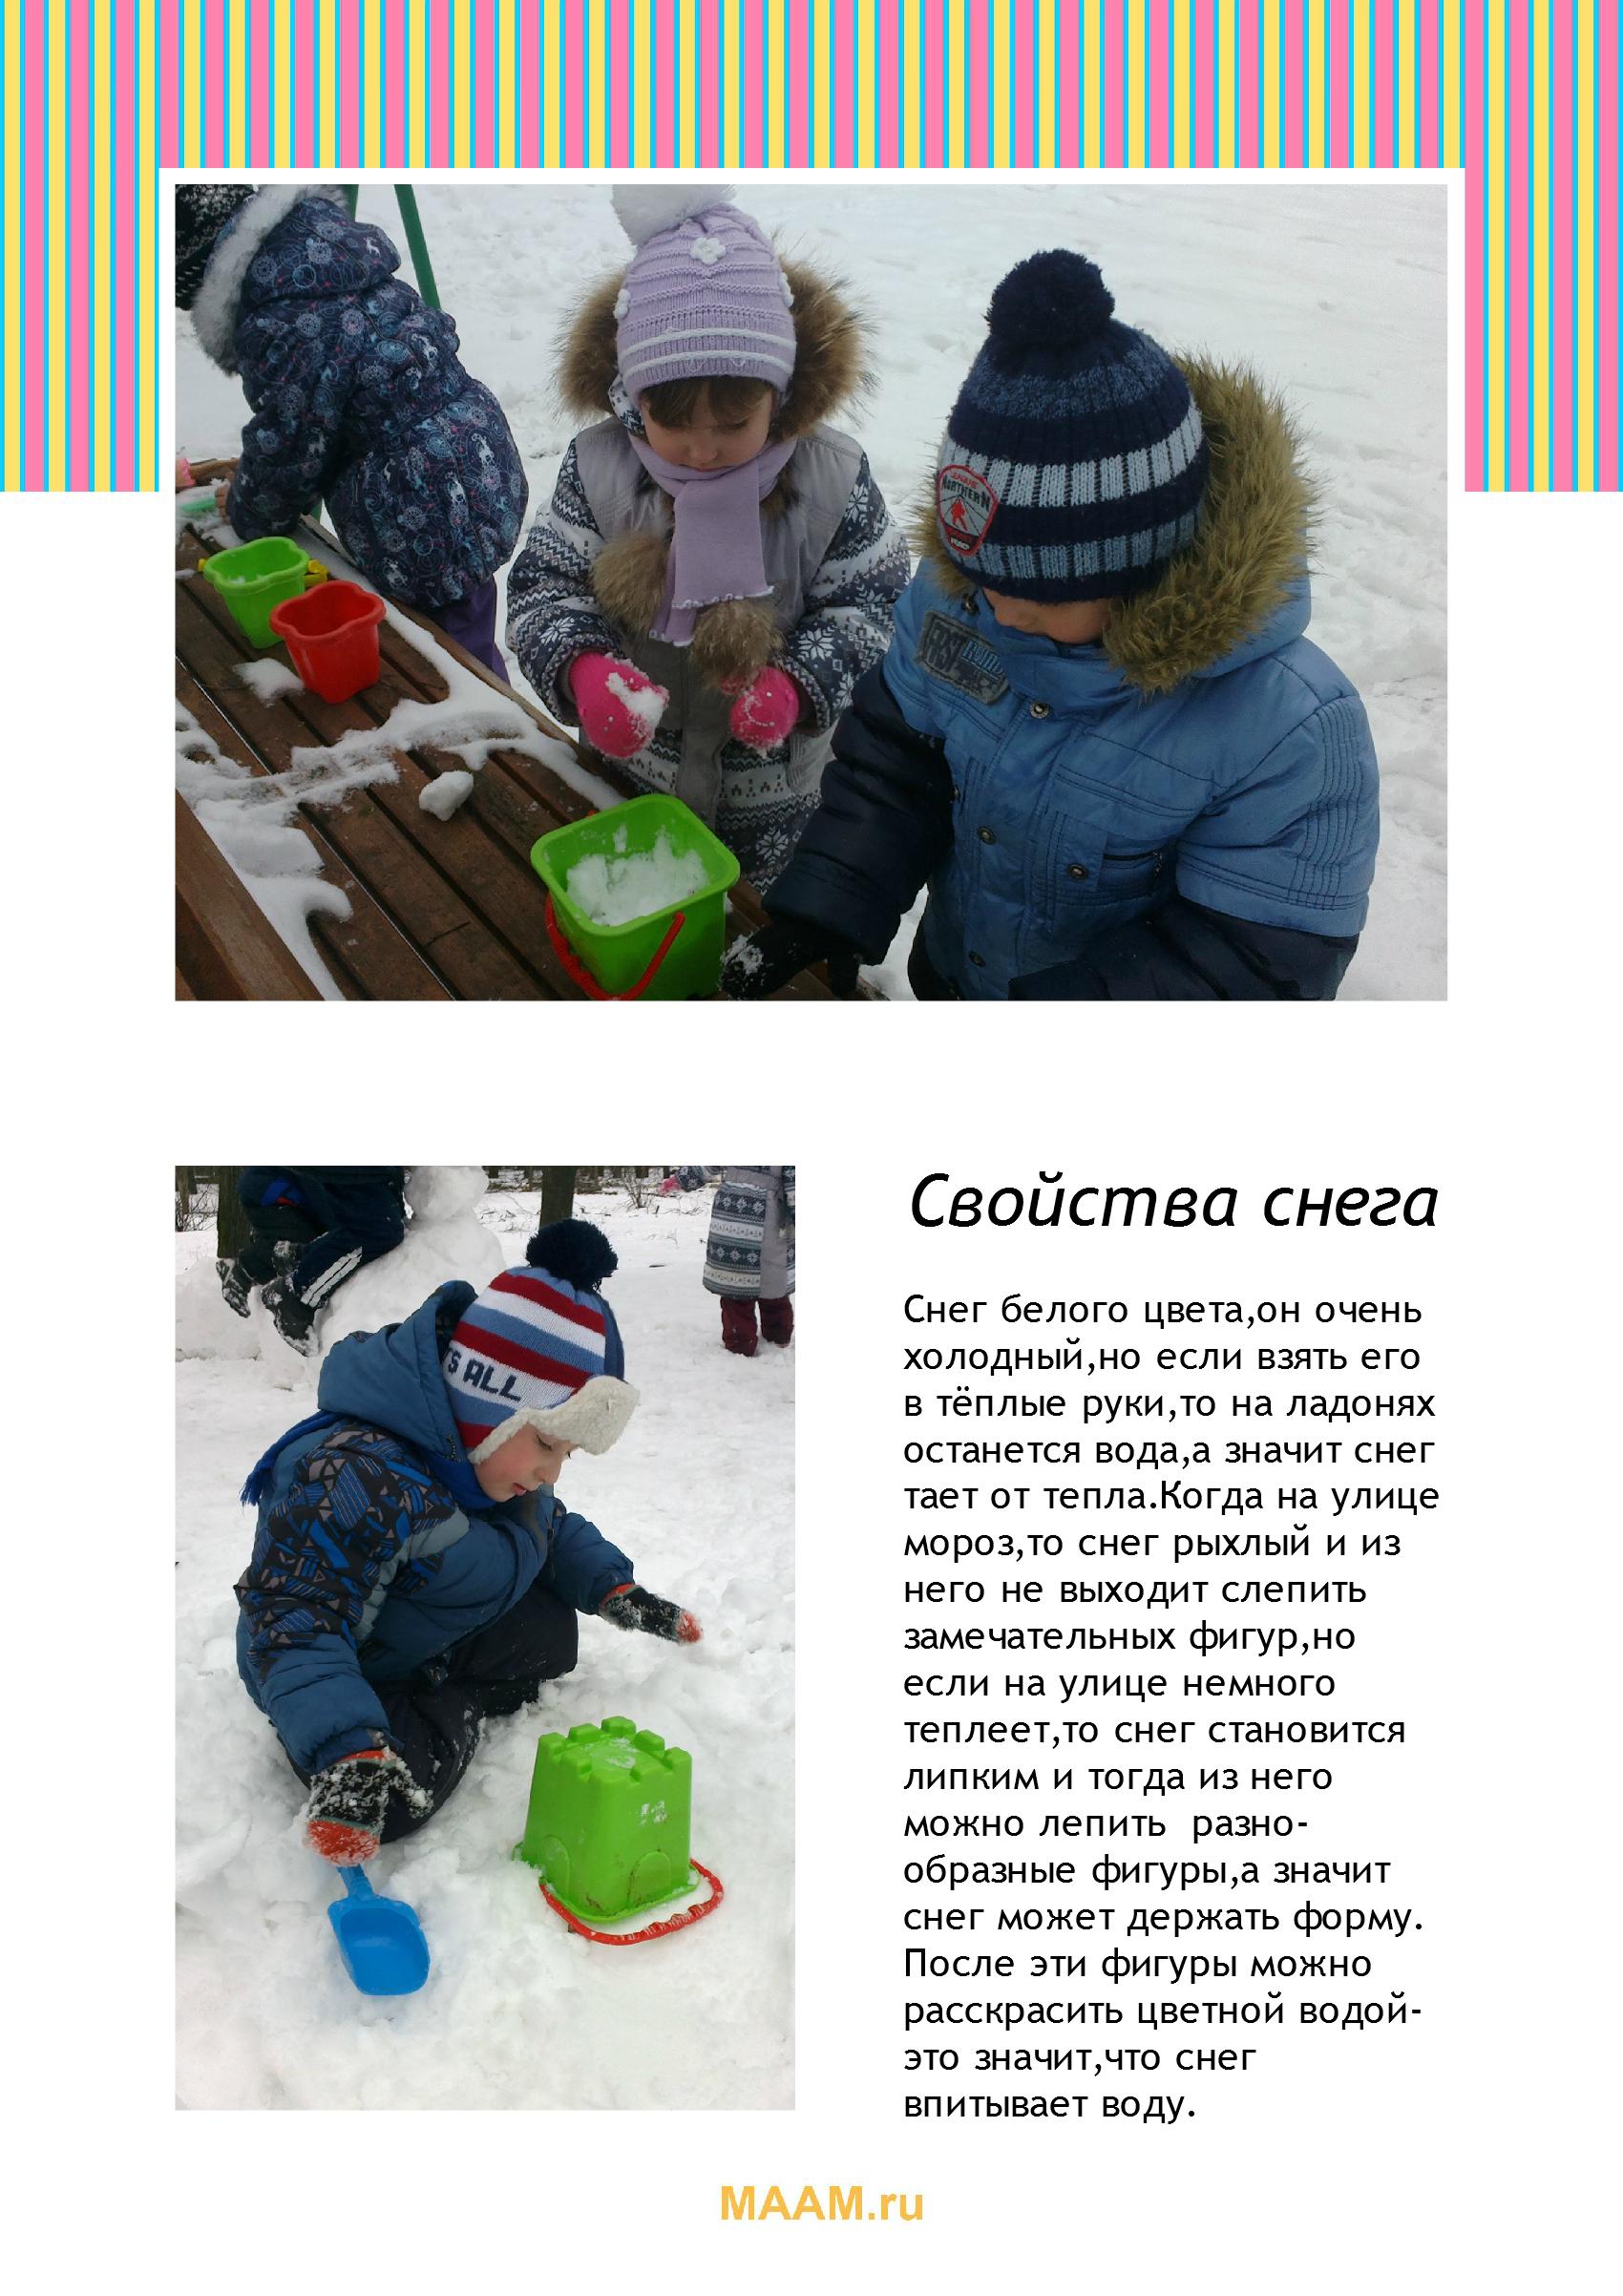 F:\аттестация\Готово\Проект снег\3.jpg